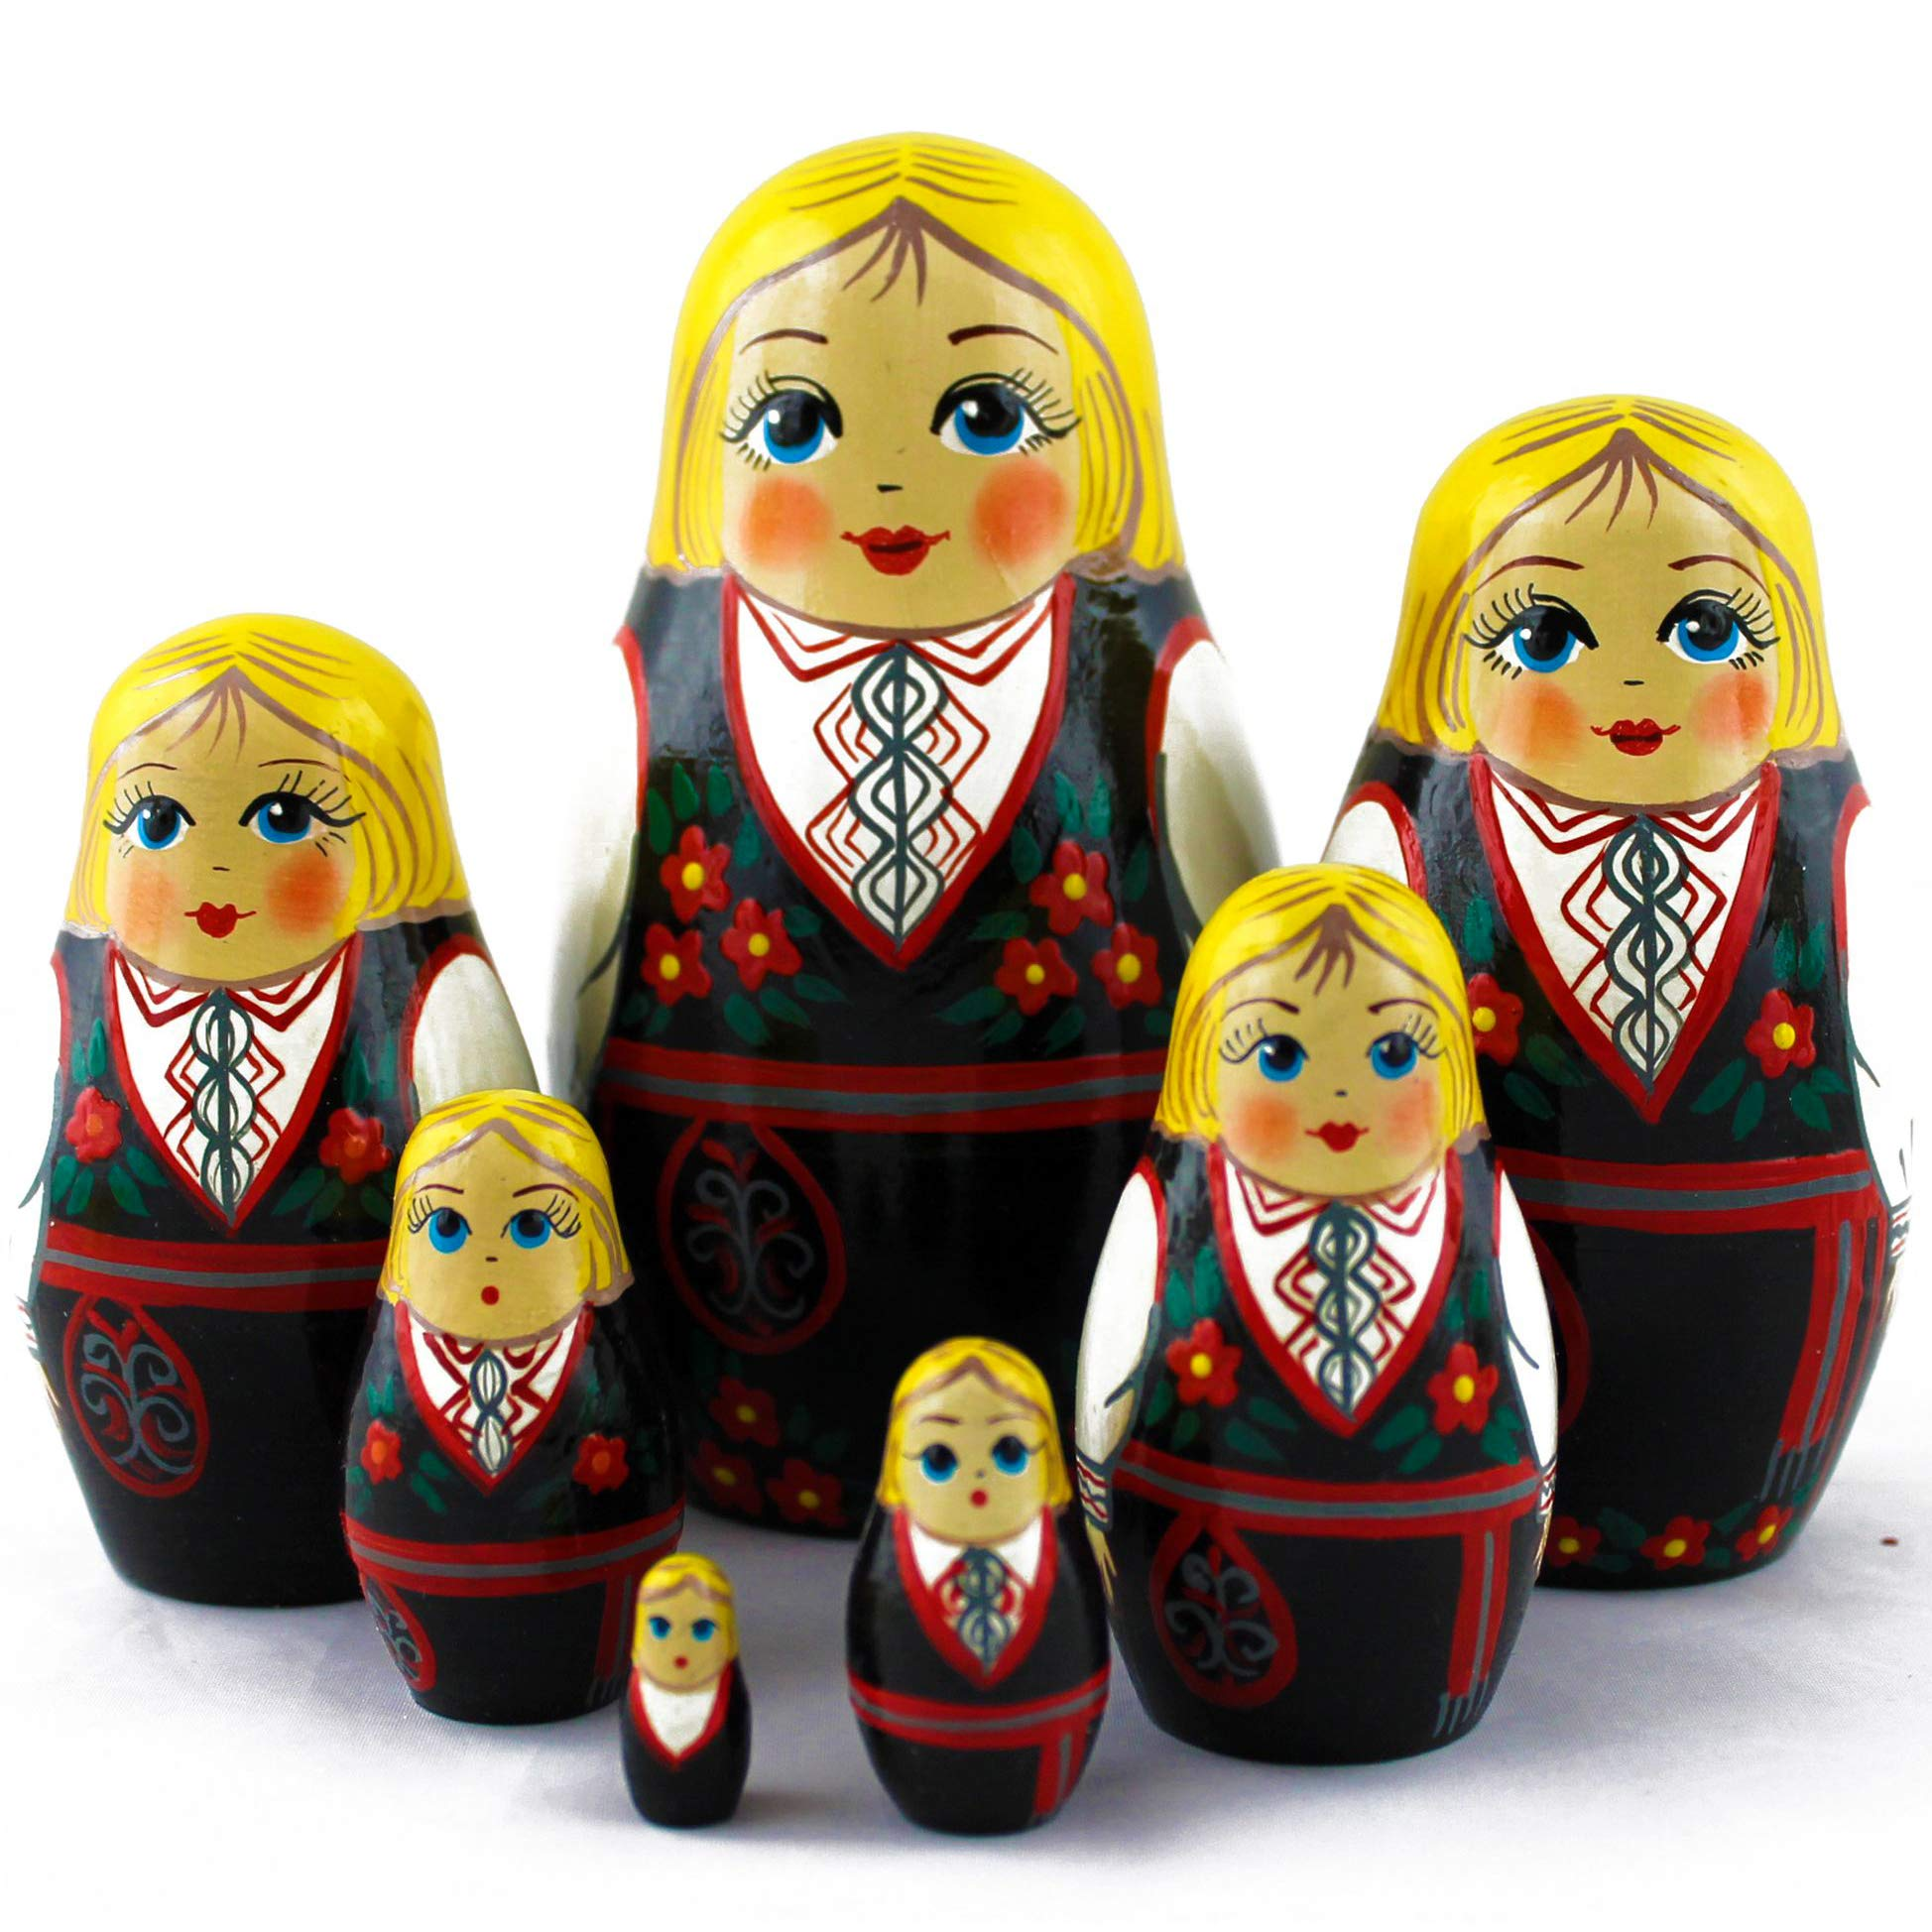 Wooden Nesting Dolls - Matryoshka Dolls Norwegian Folk Dress Set 7 pcs by MATRYOSHKA&HANDICRAFT